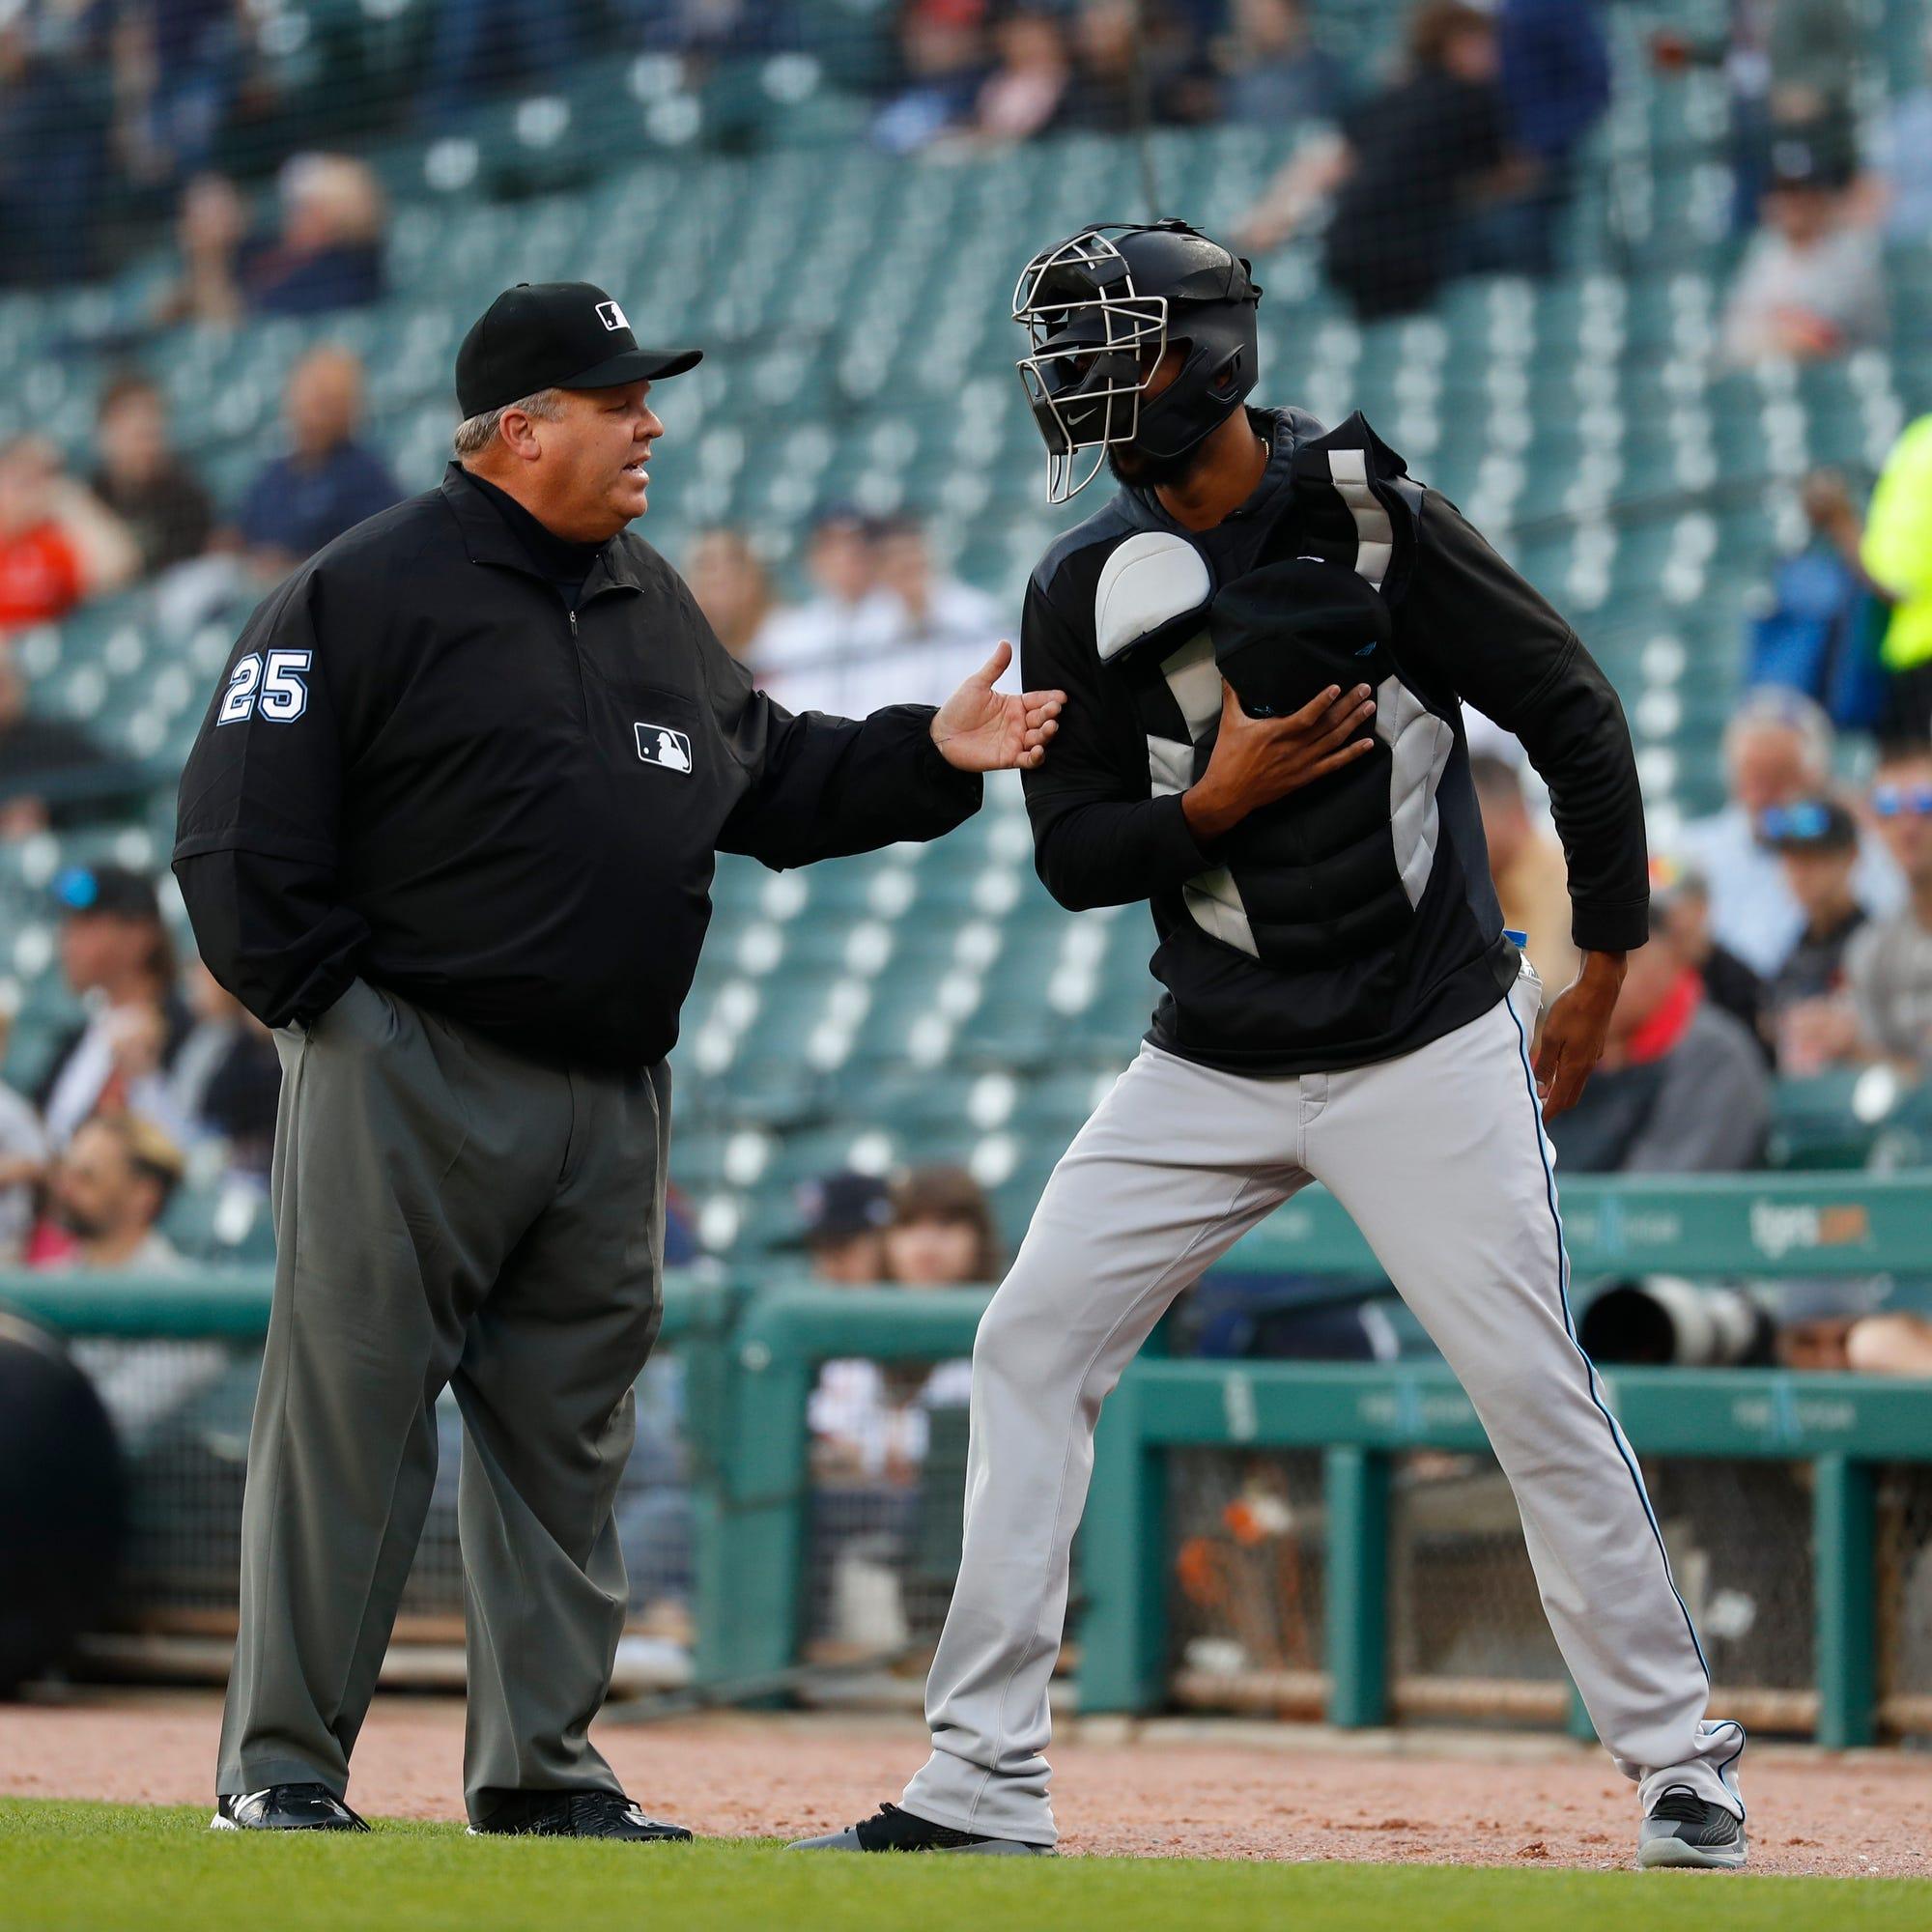 The Tigers got one (minor) victory Wednesday; Stumpf wins standoff